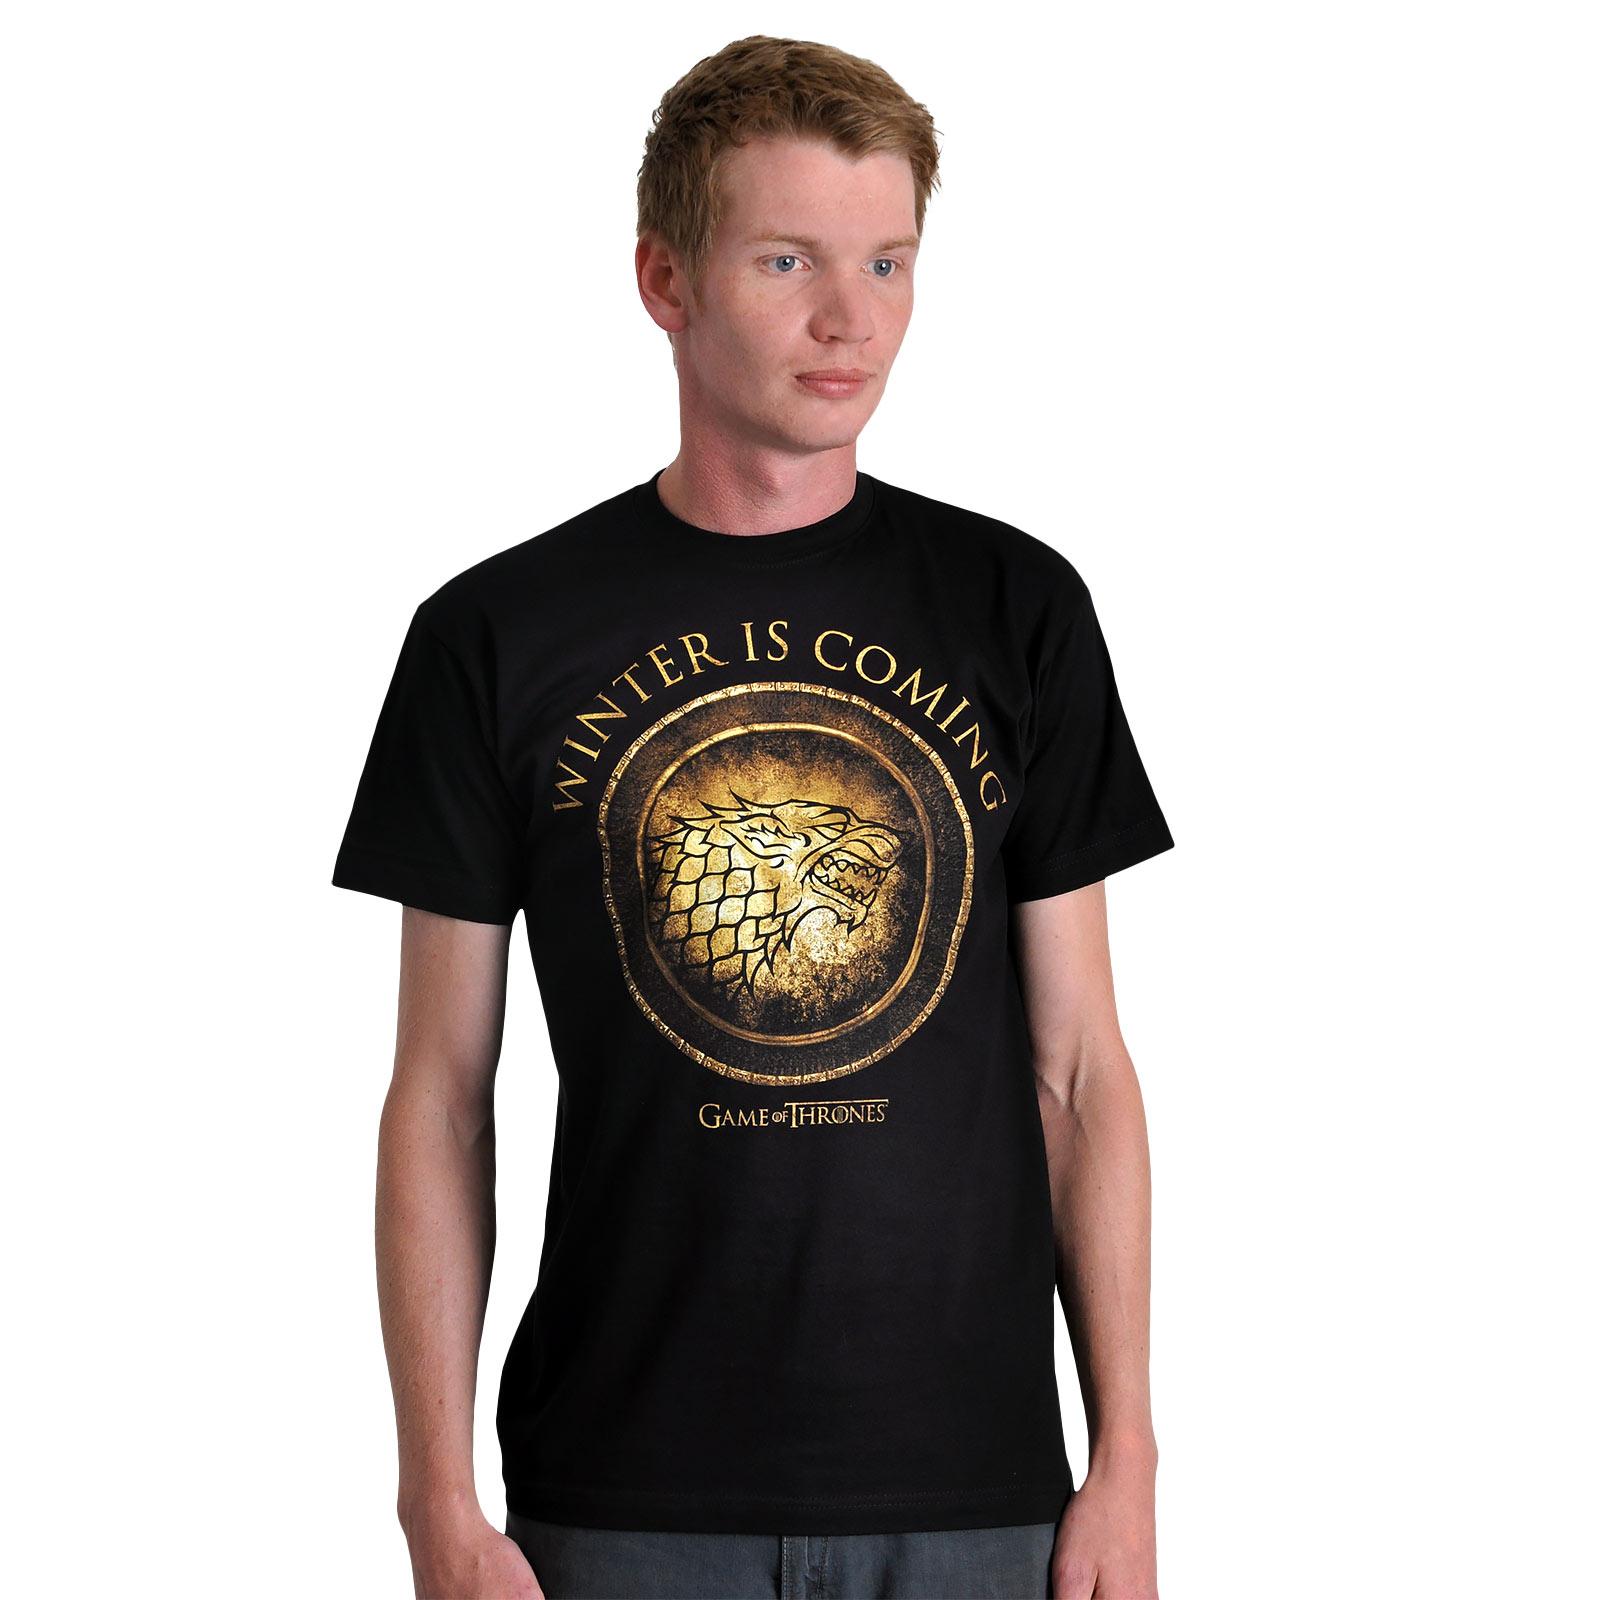 Game of Thrones - House Stark Circular T-Shirt